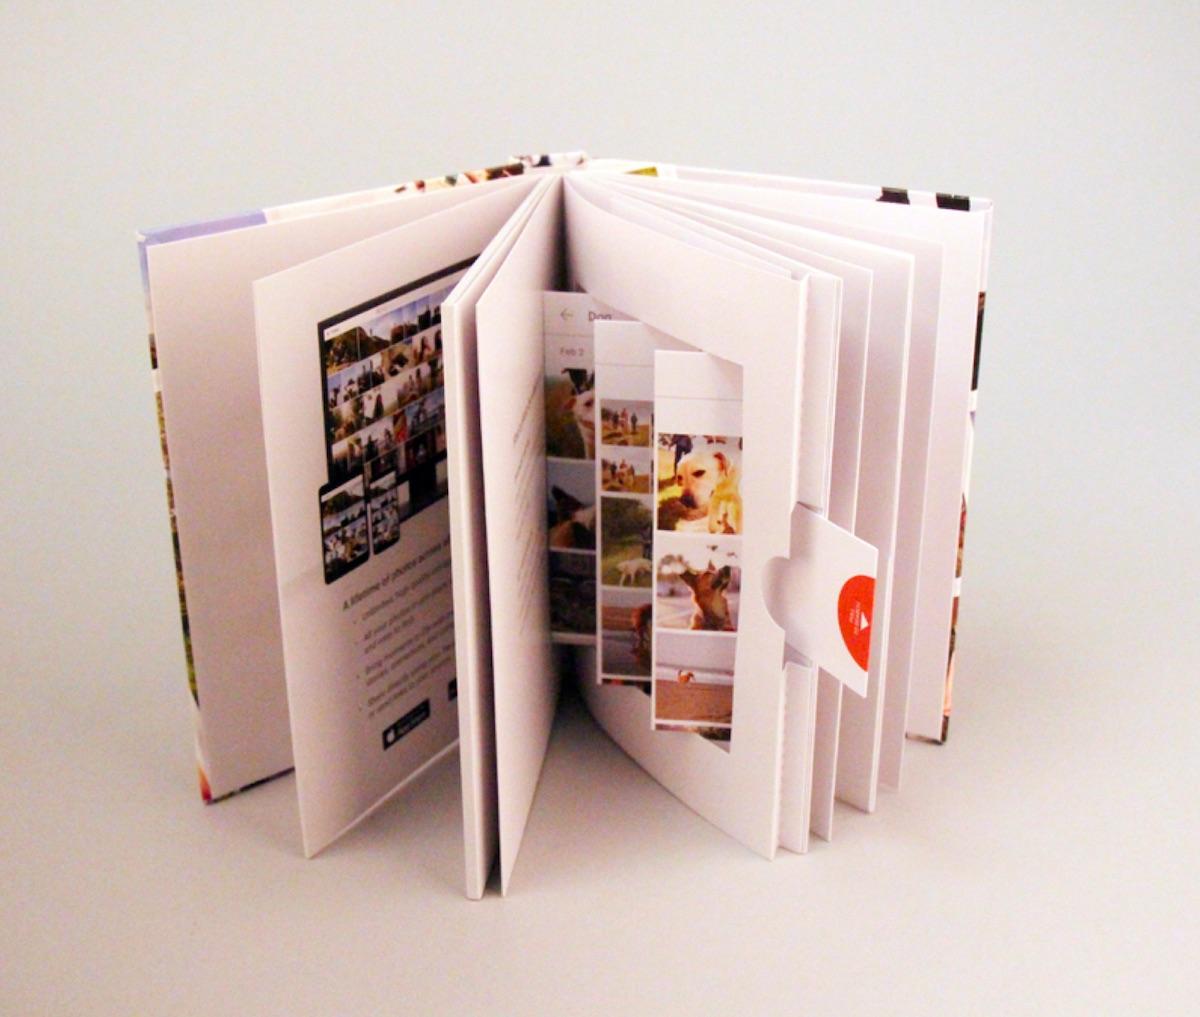 Http Www Paperspecs Com Paper News Google Photo Pop Up Book Design